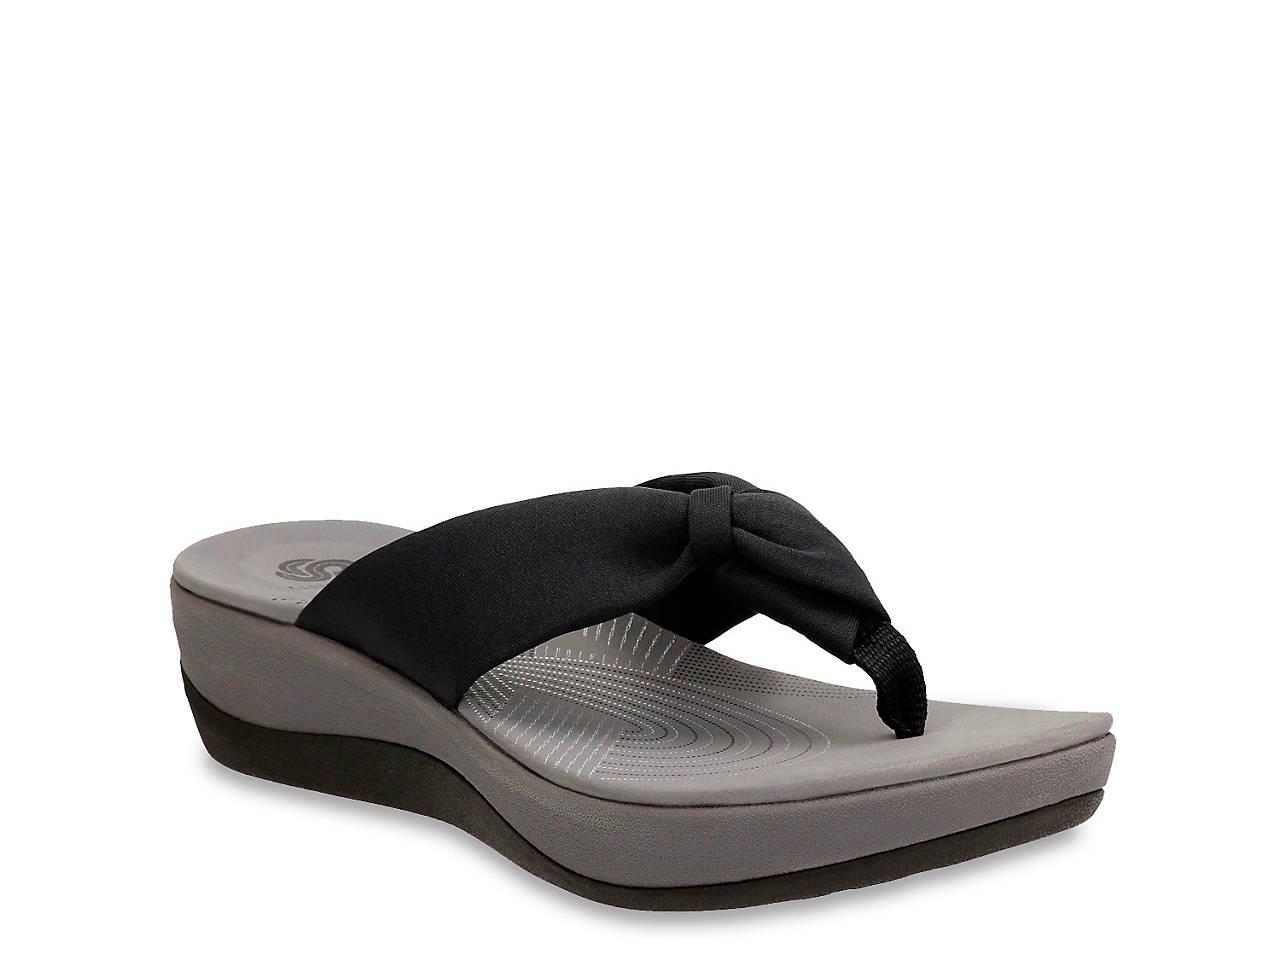 nike free run wide width mens flip-flops